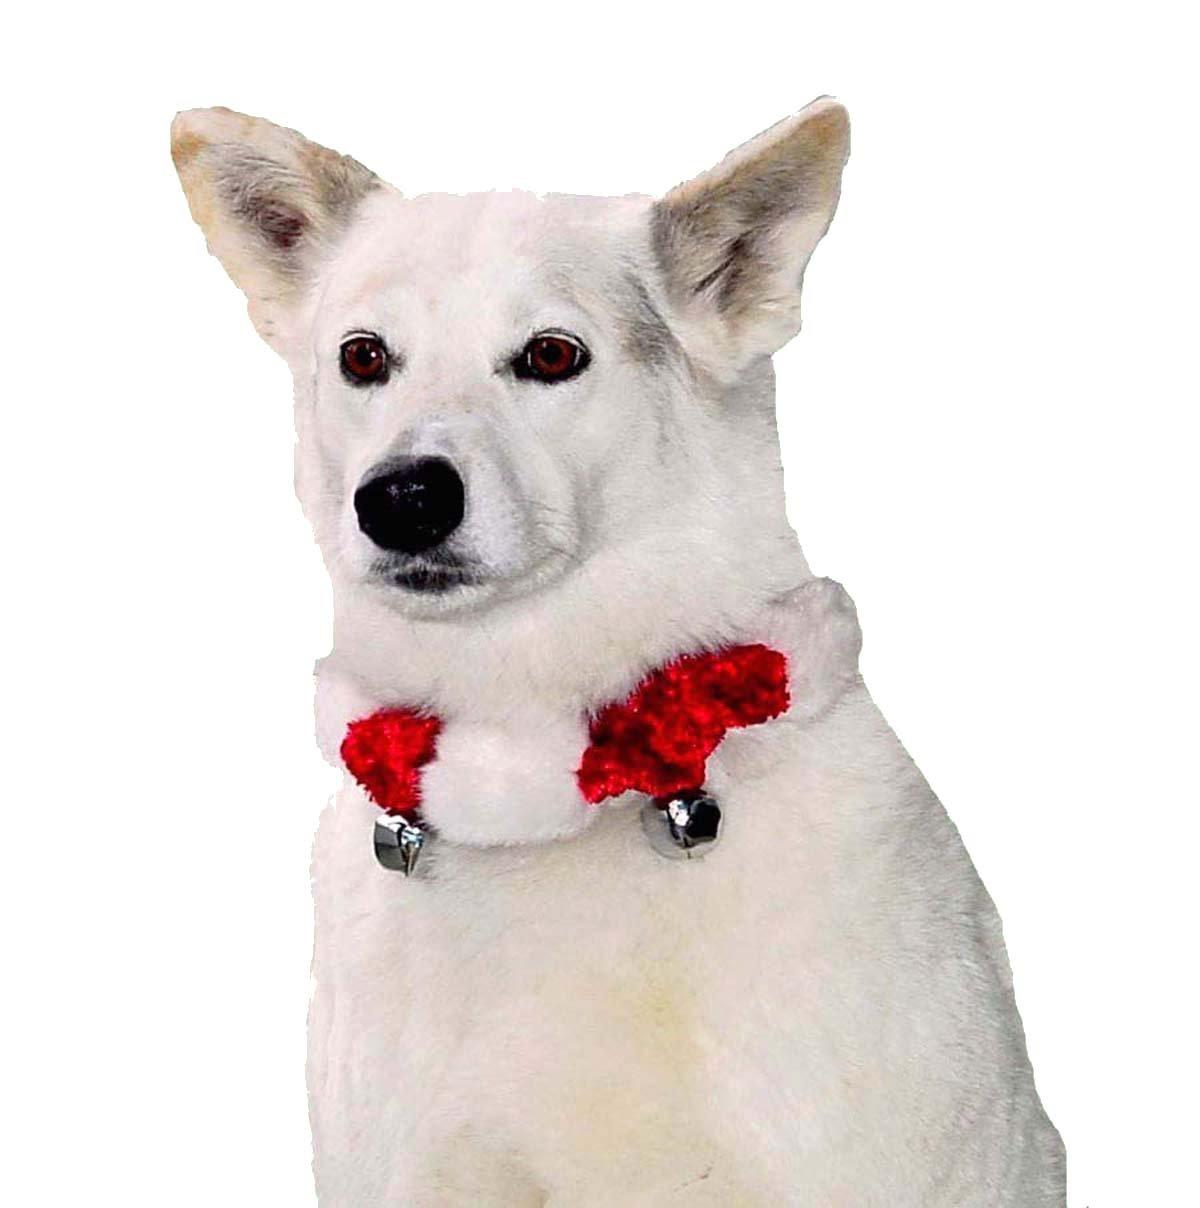 amazon com outward hound kyjen pp01761 dog bell collar holiday